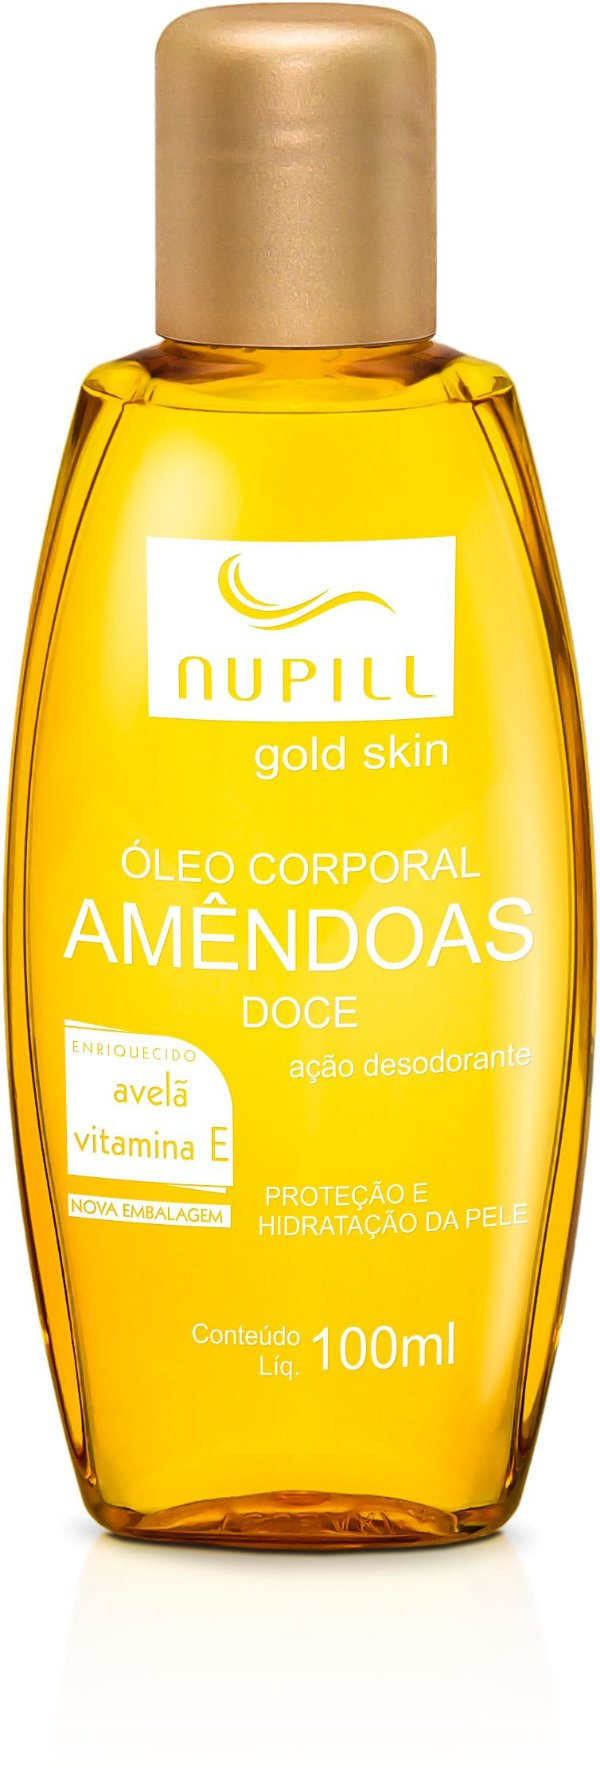 NUPILL GOLD SKIN ÓLEO CORPORAL DE AMÊNDOAS AVELÃ / VITAMINA E 100ML